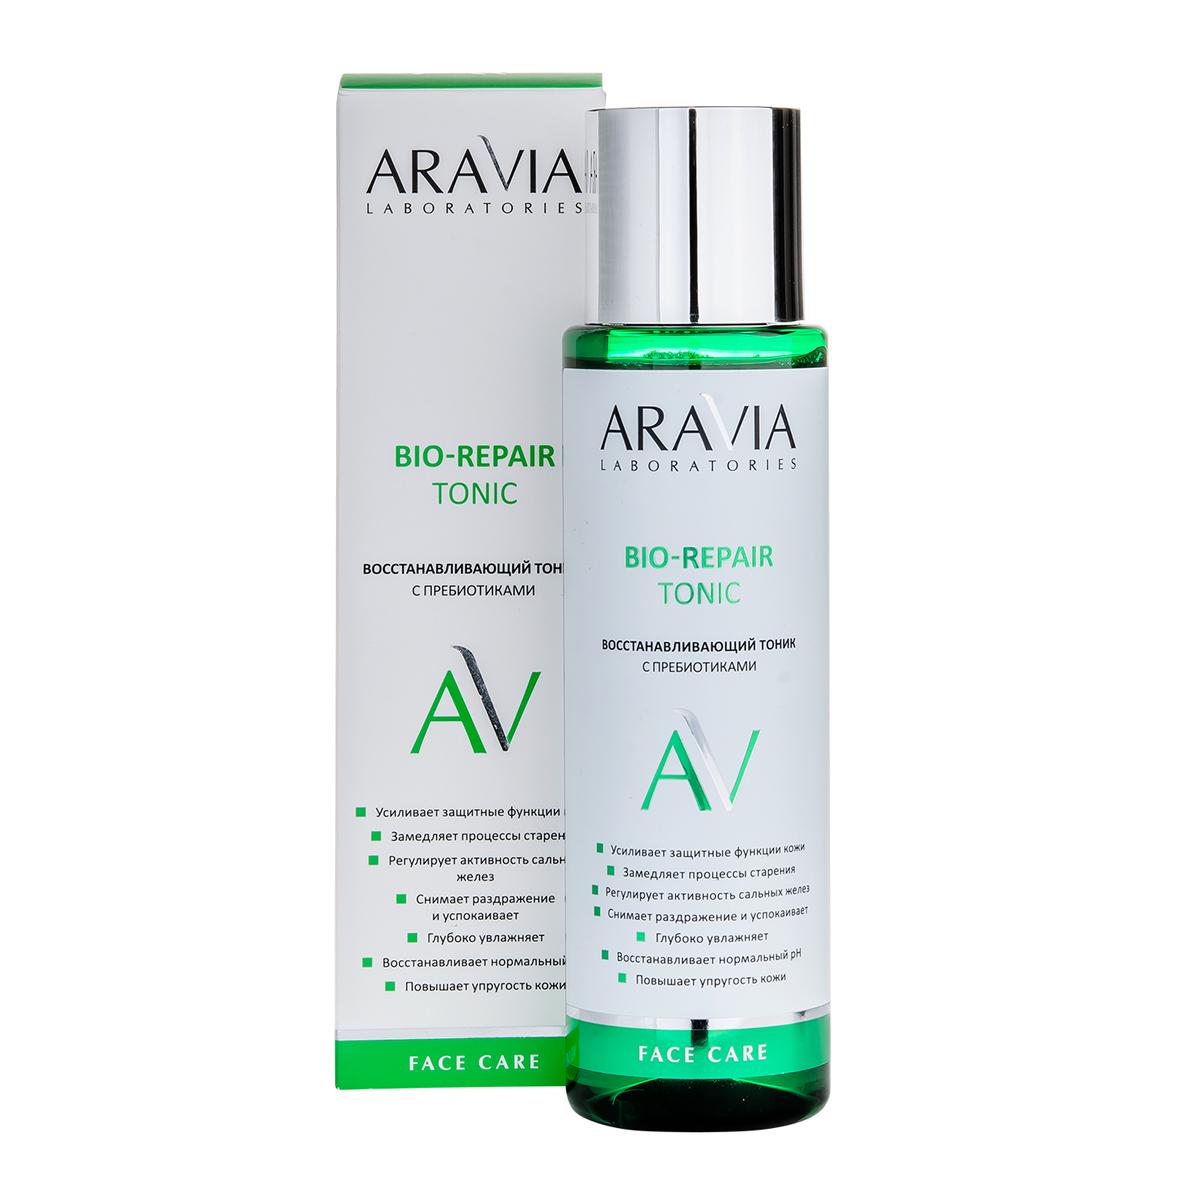 Aravia Laboratories Восстанавливающий тоник с пребиотиками Bio-Repair Tonic, 250 мл (Aravia Laboratories, Уход за лицом)